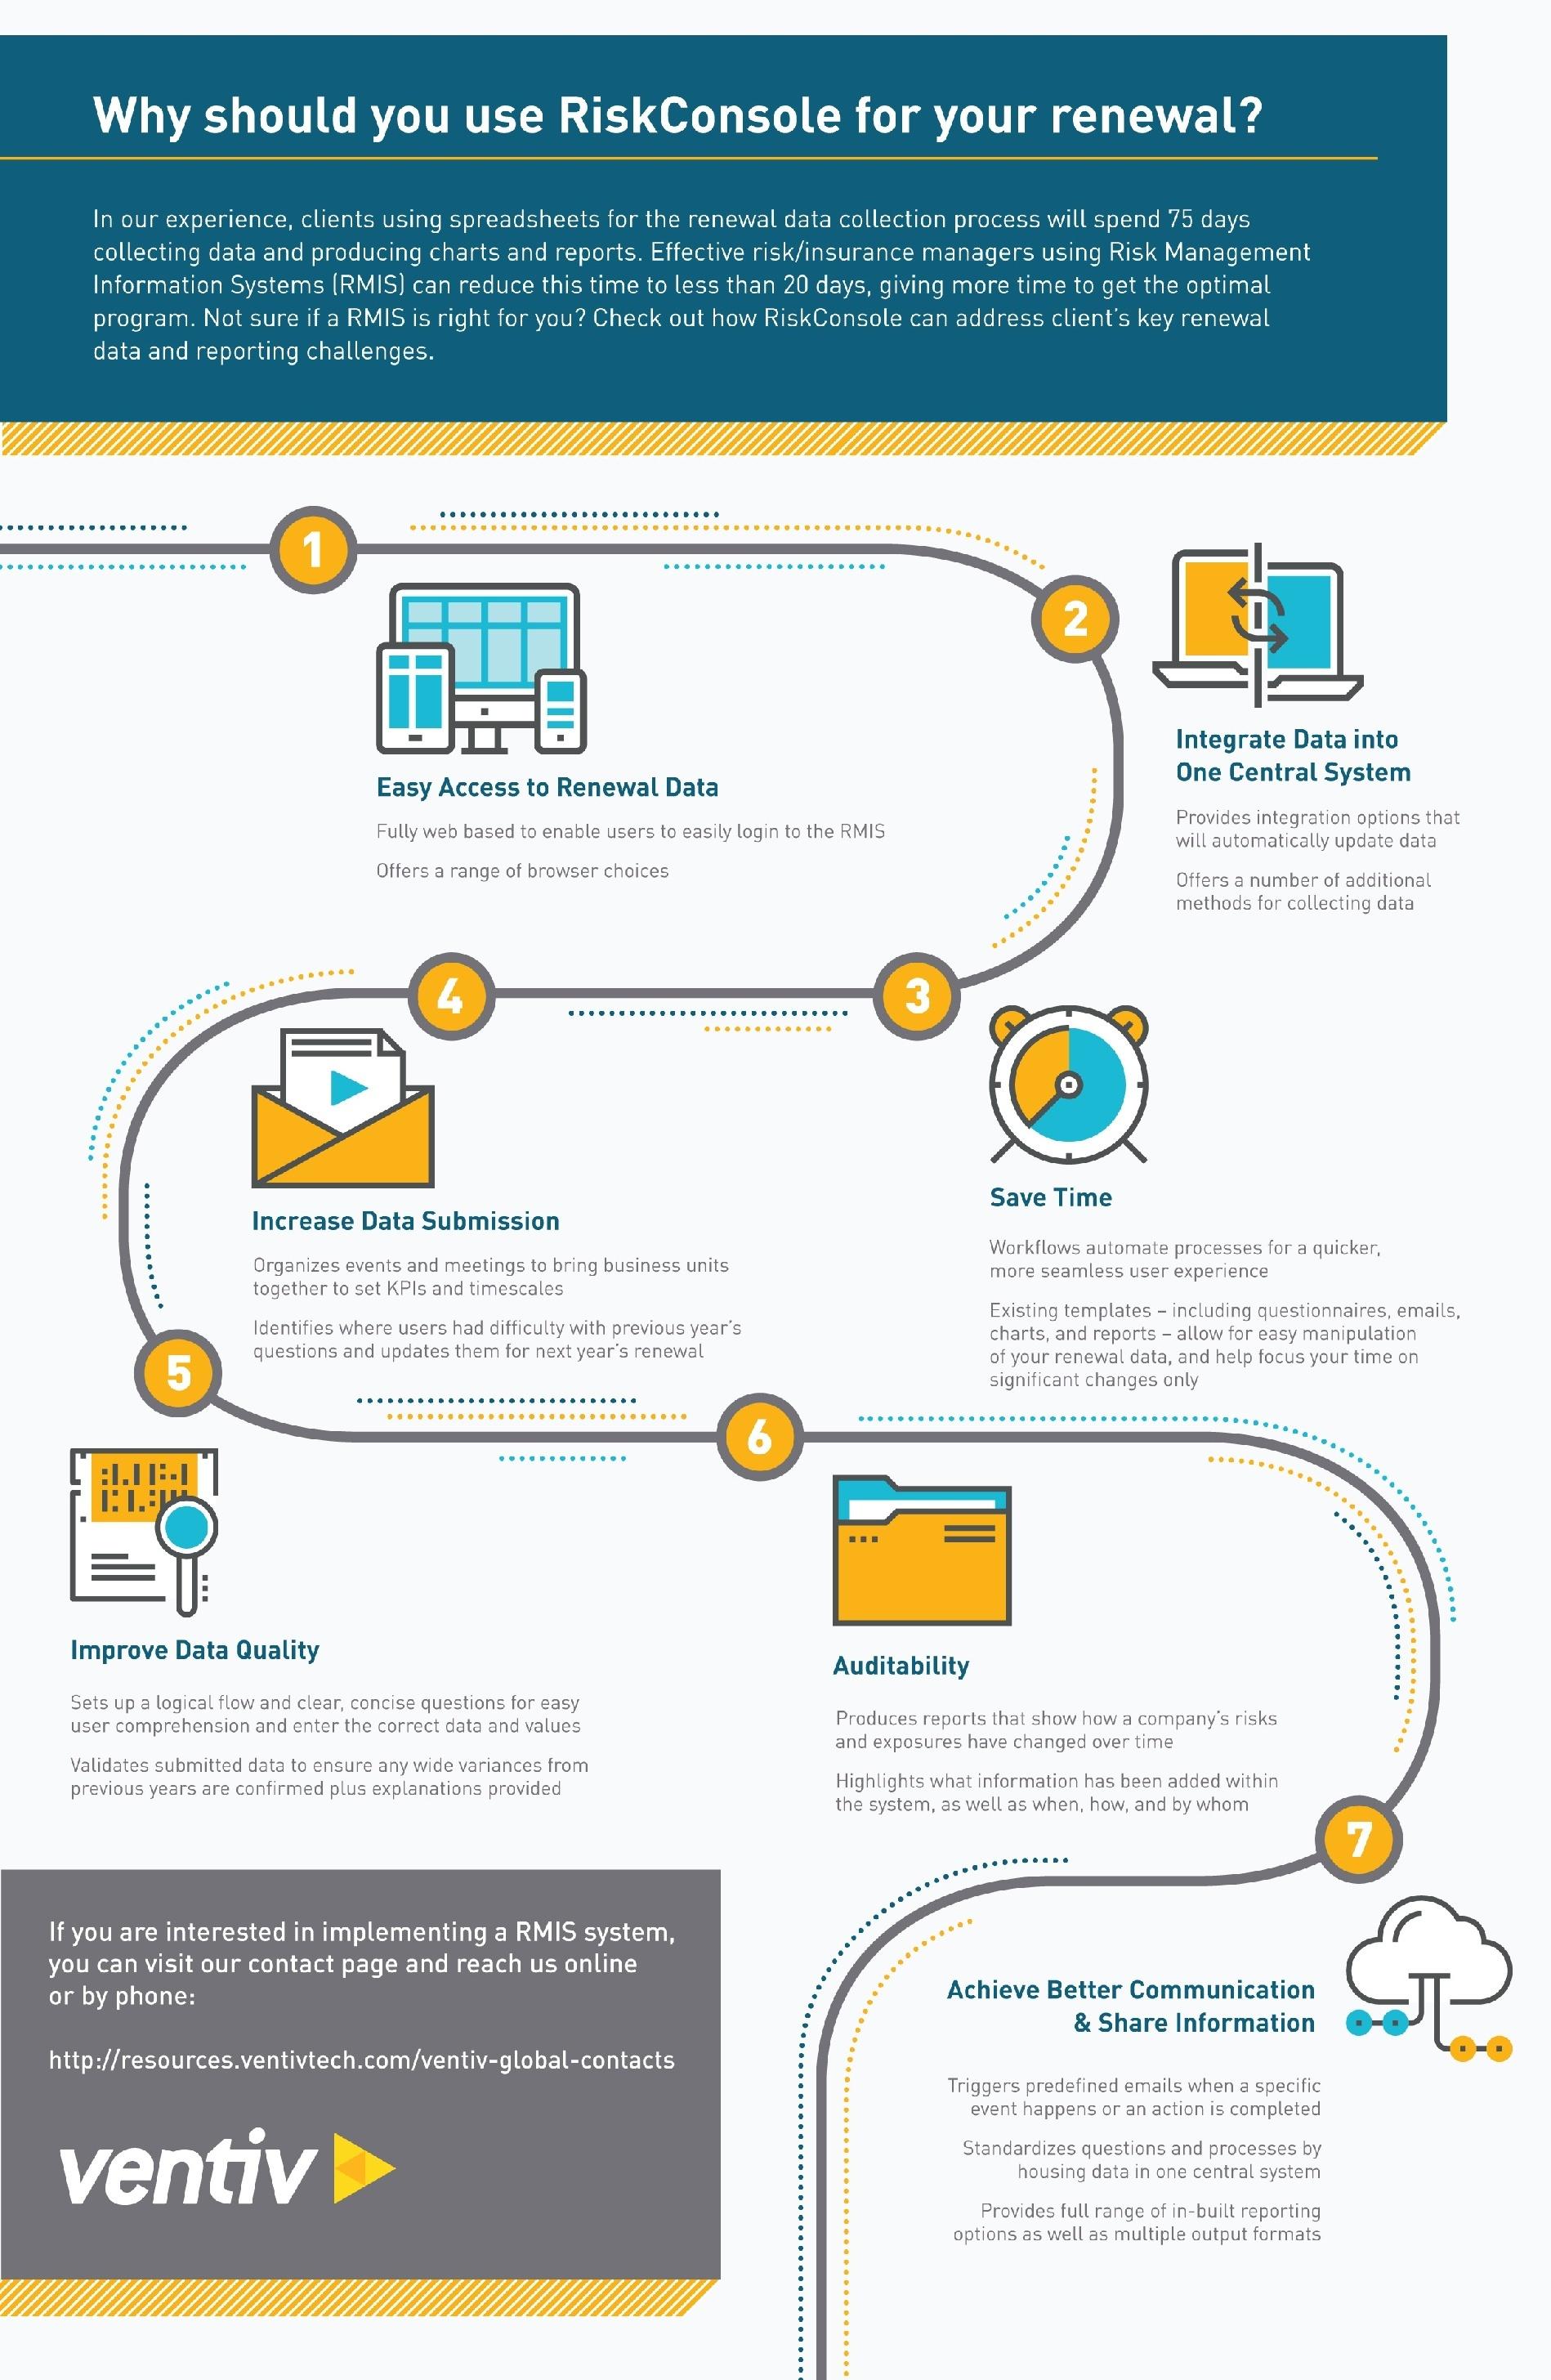 Ventiv_RMISRenewal_Infographic-1